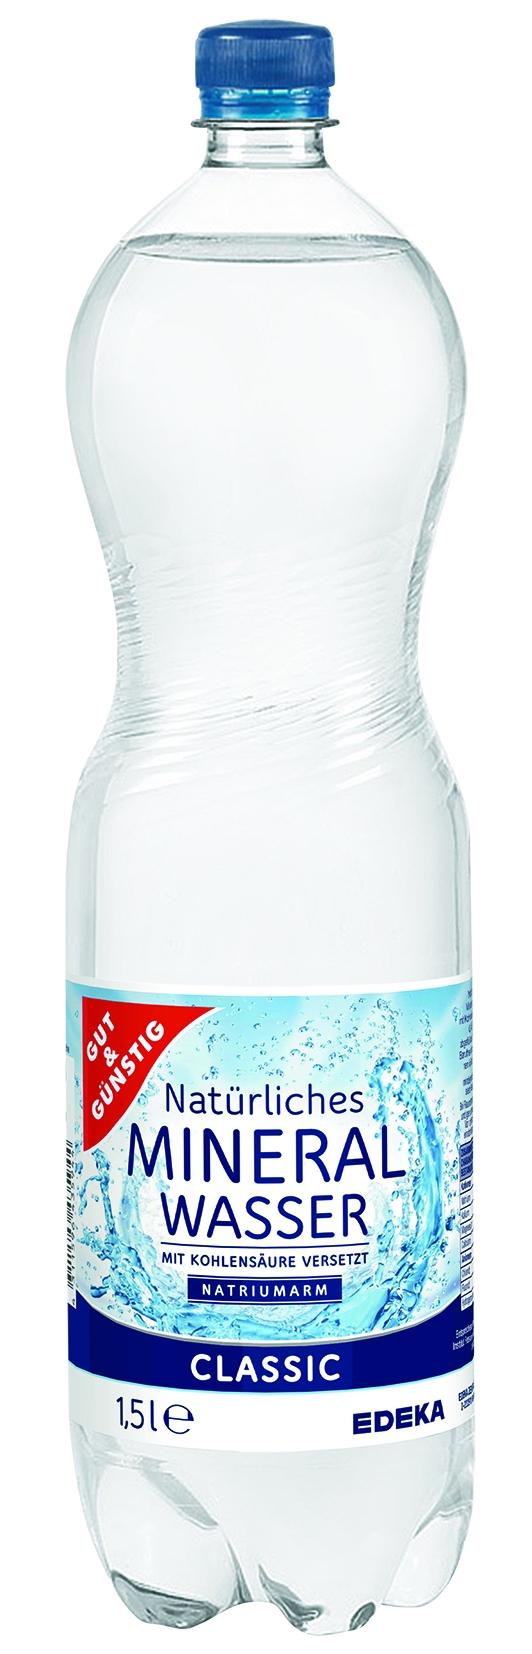 Mineralwasser classic PET